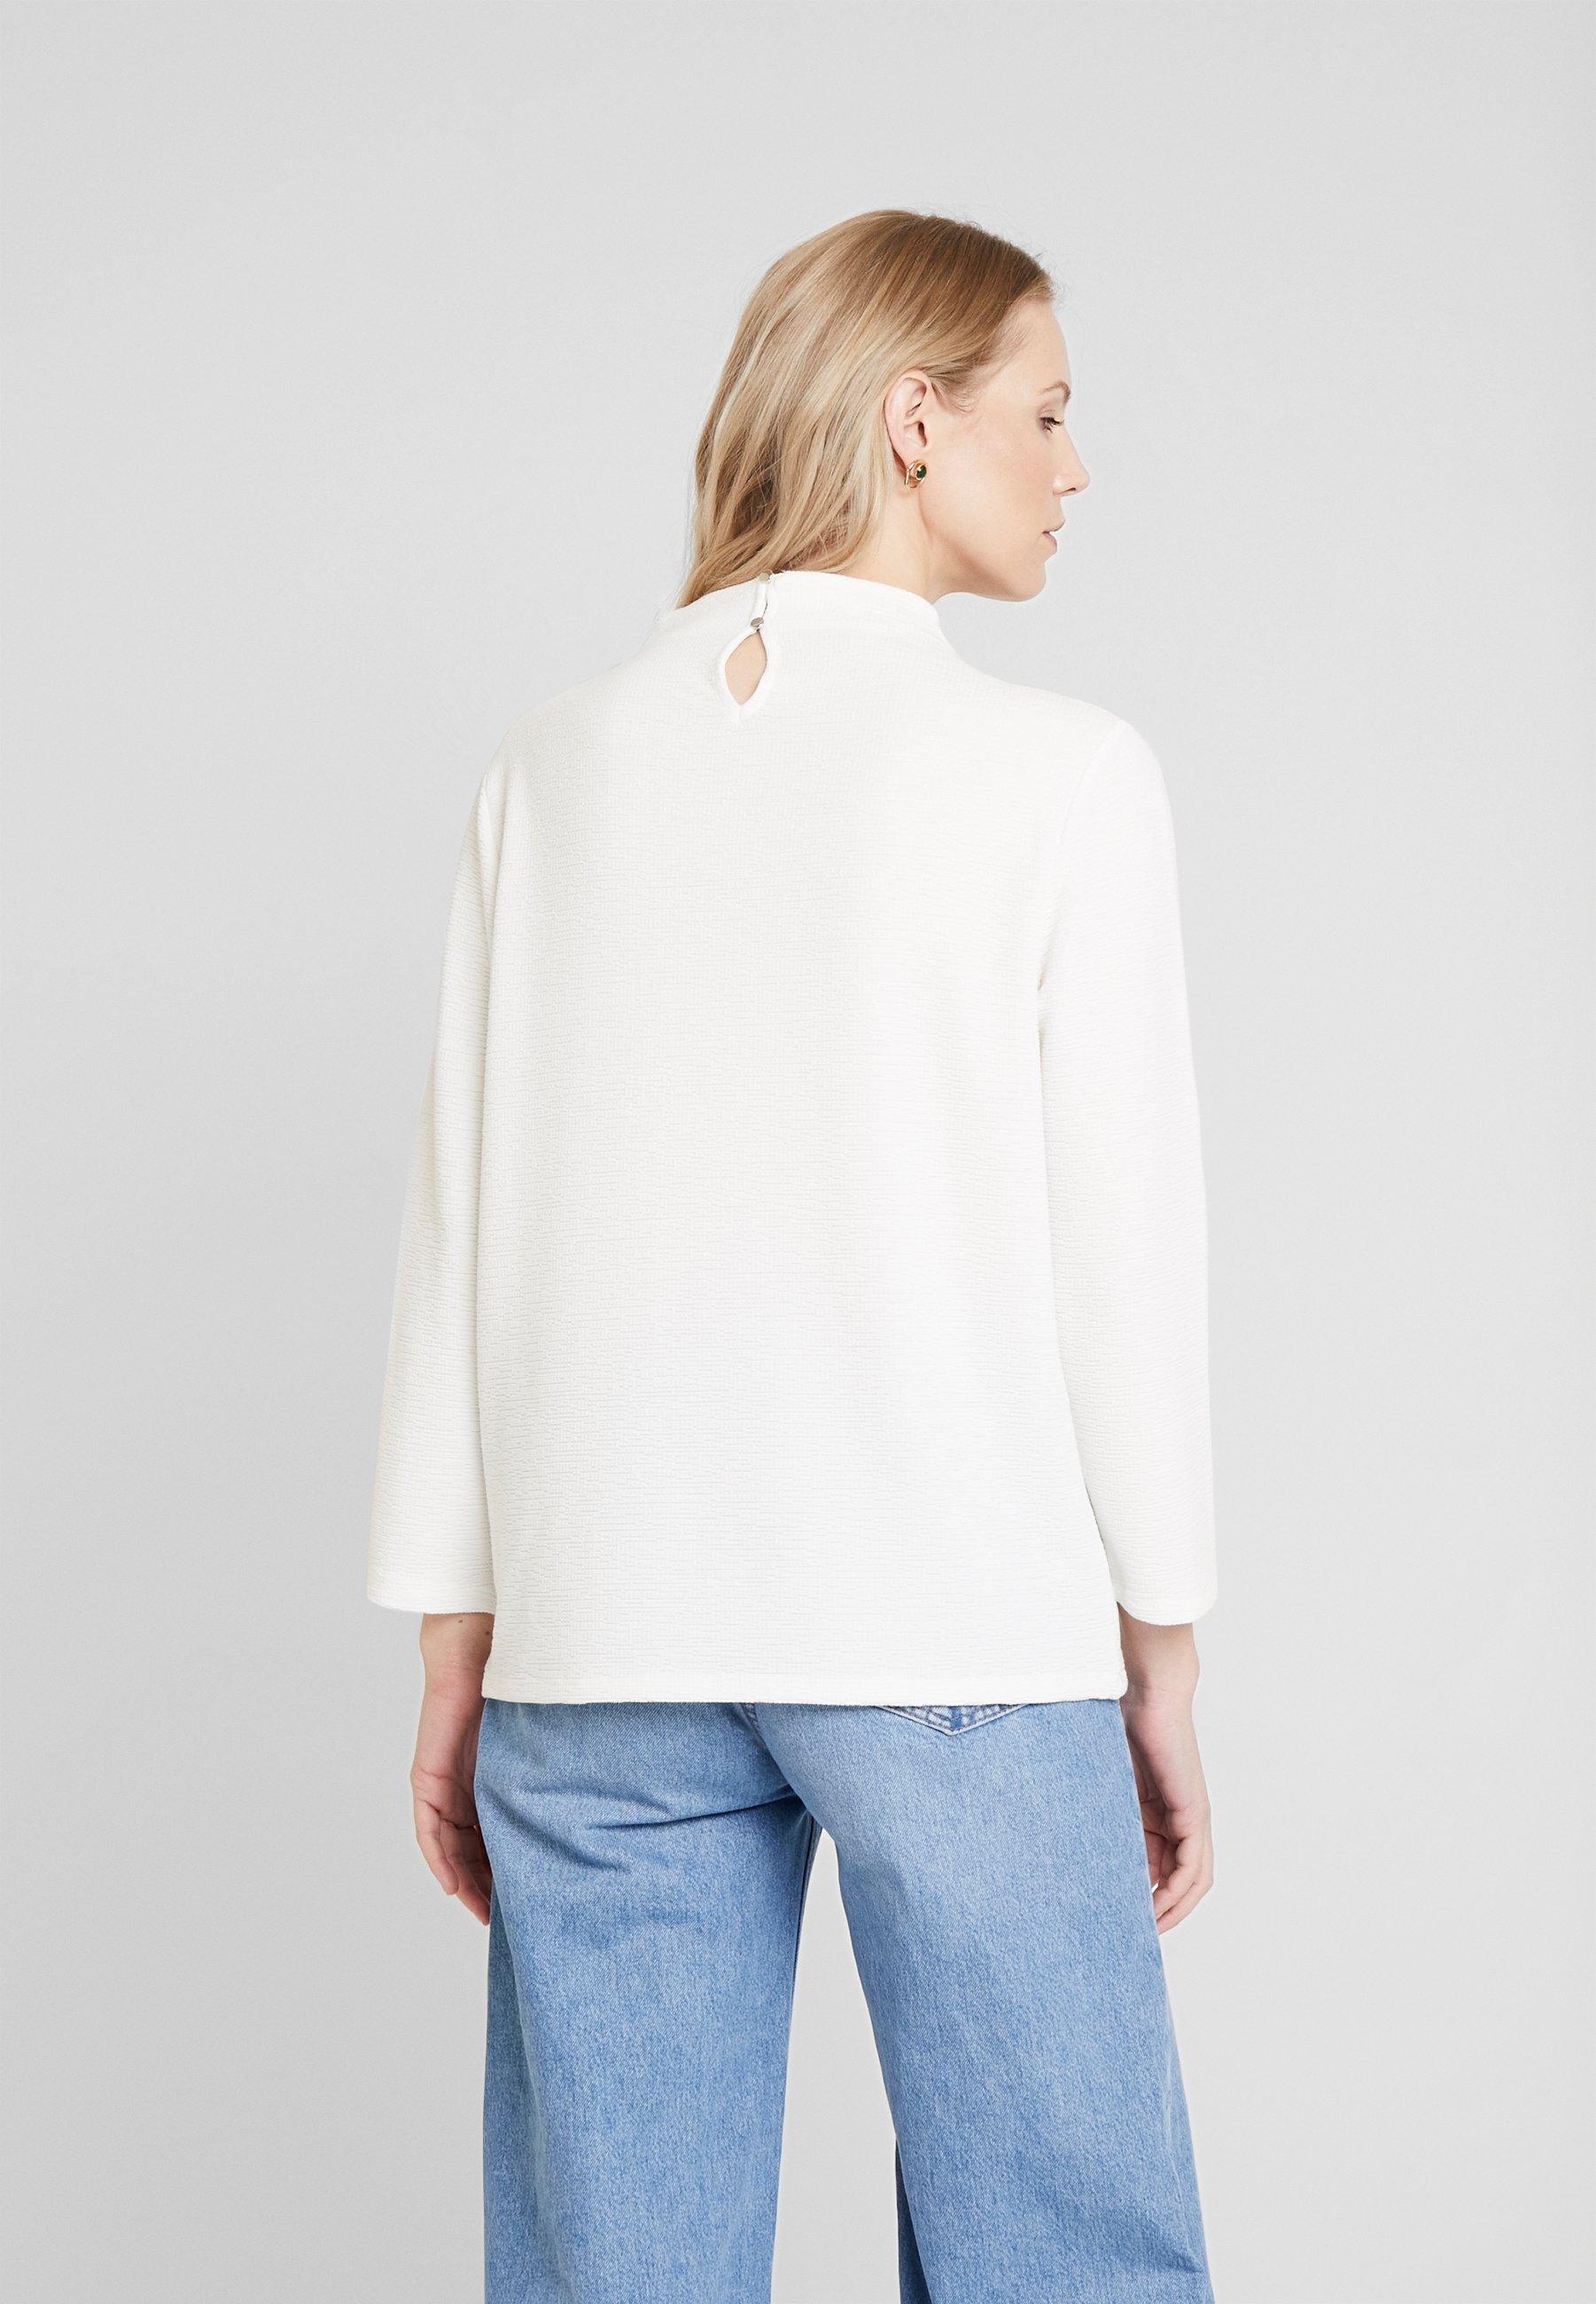 TOM TAILOR STRUCTURE - Langarmshirt whisper white